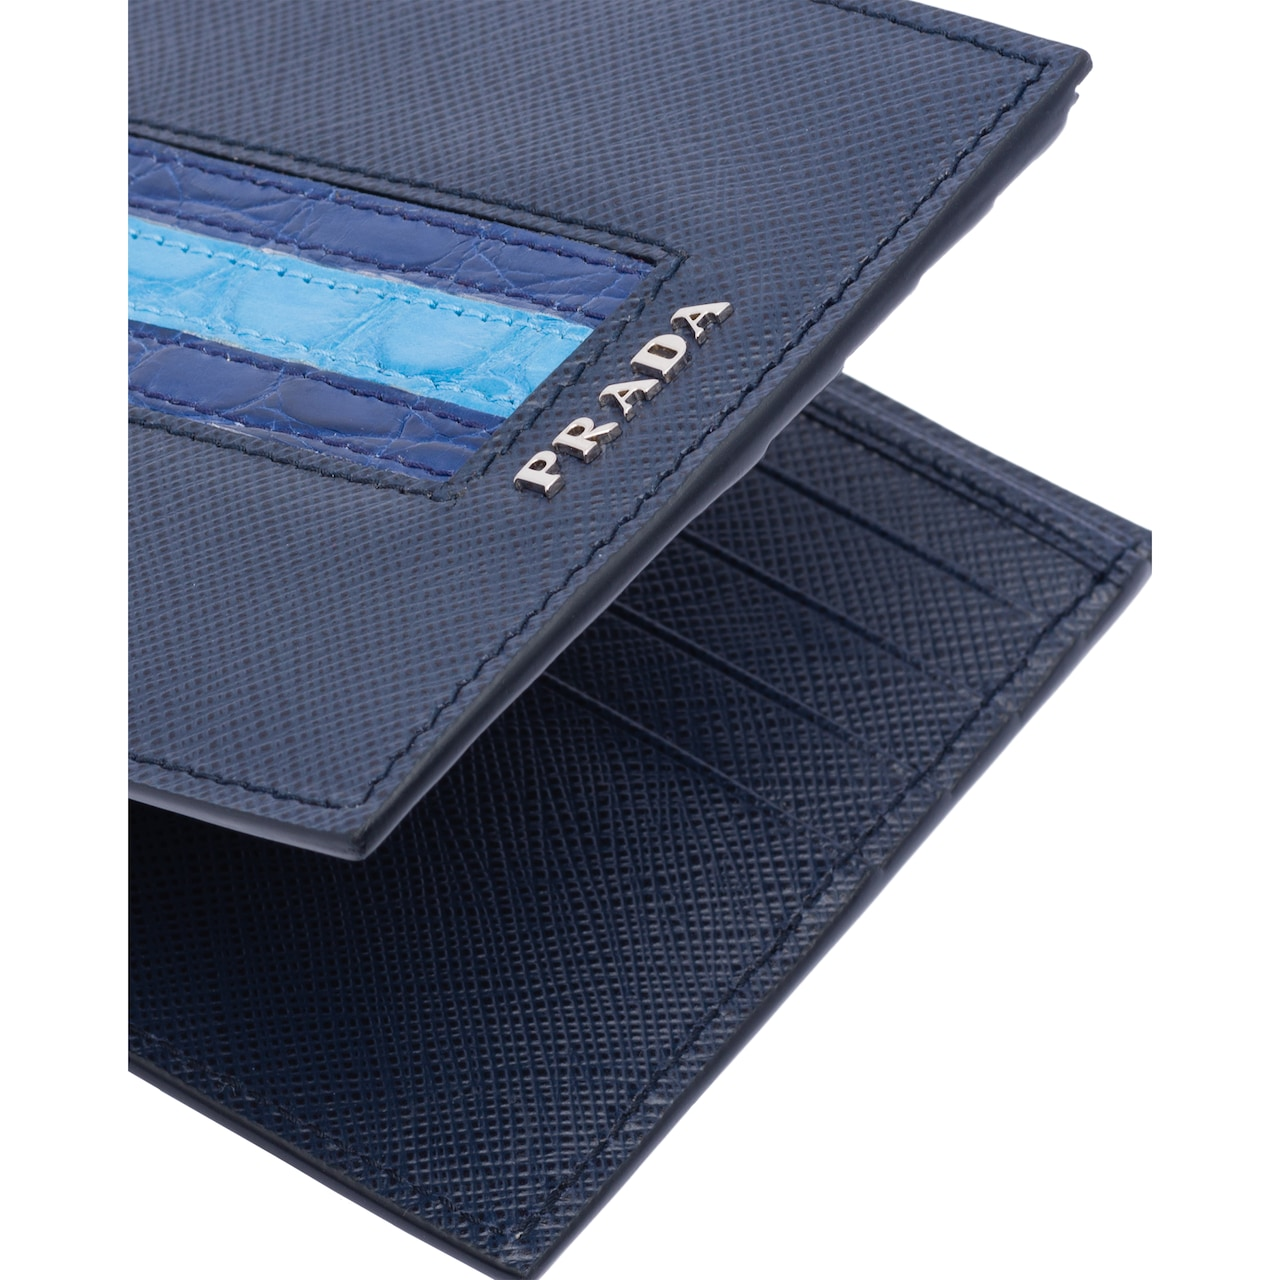 Prada Saffiano and crocodile leather wallet 6